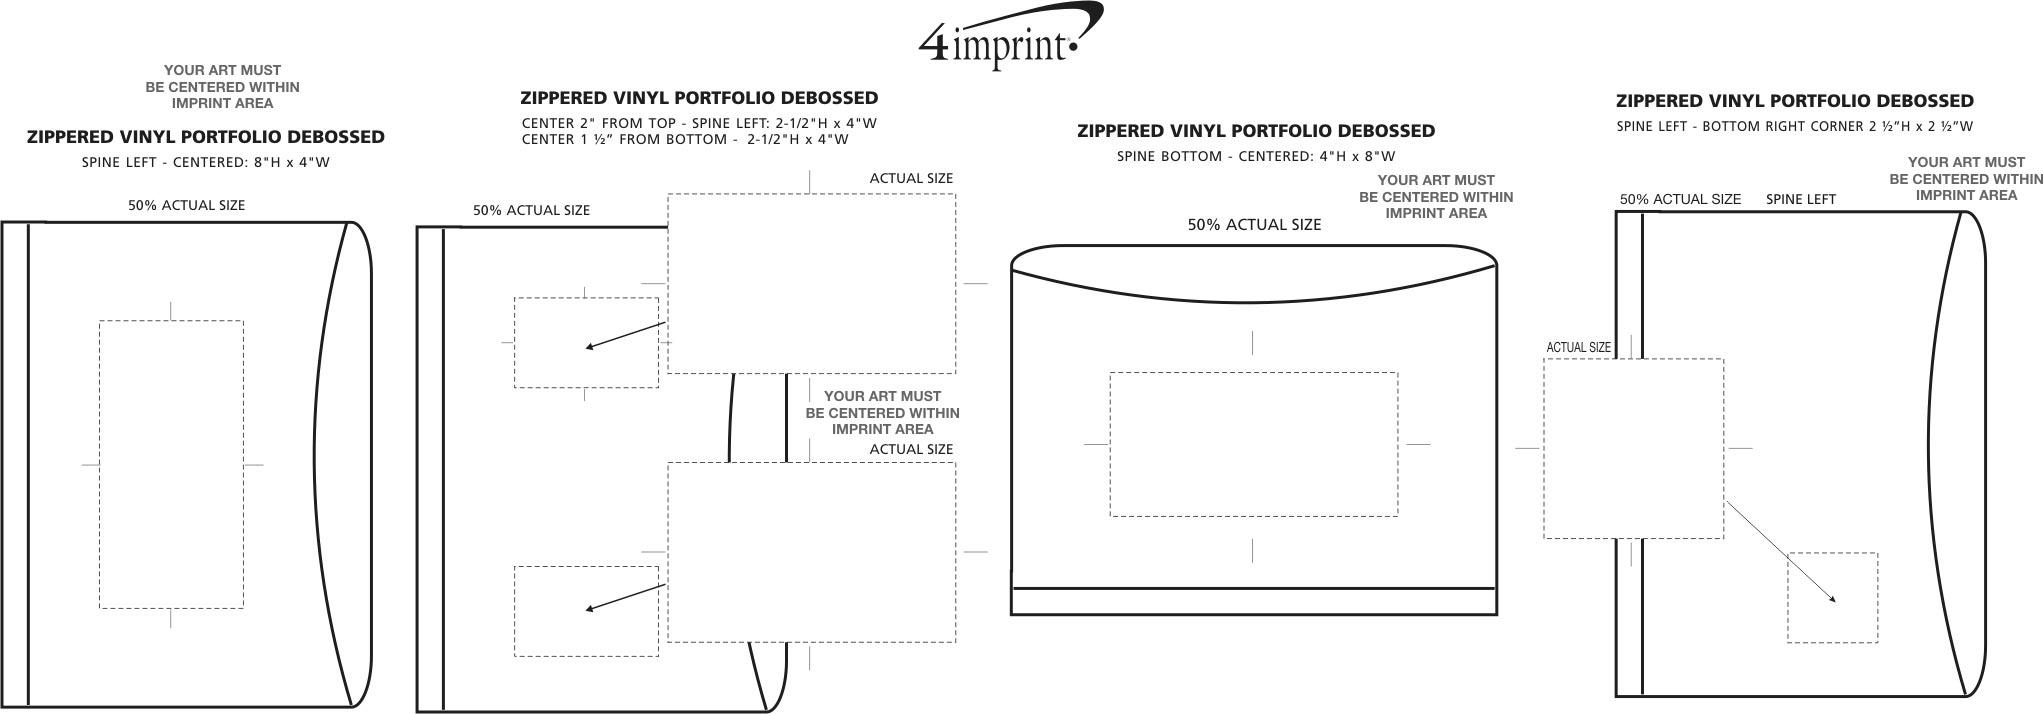 Imprint Area of Zippered Vinyl Portfolio - Debossed